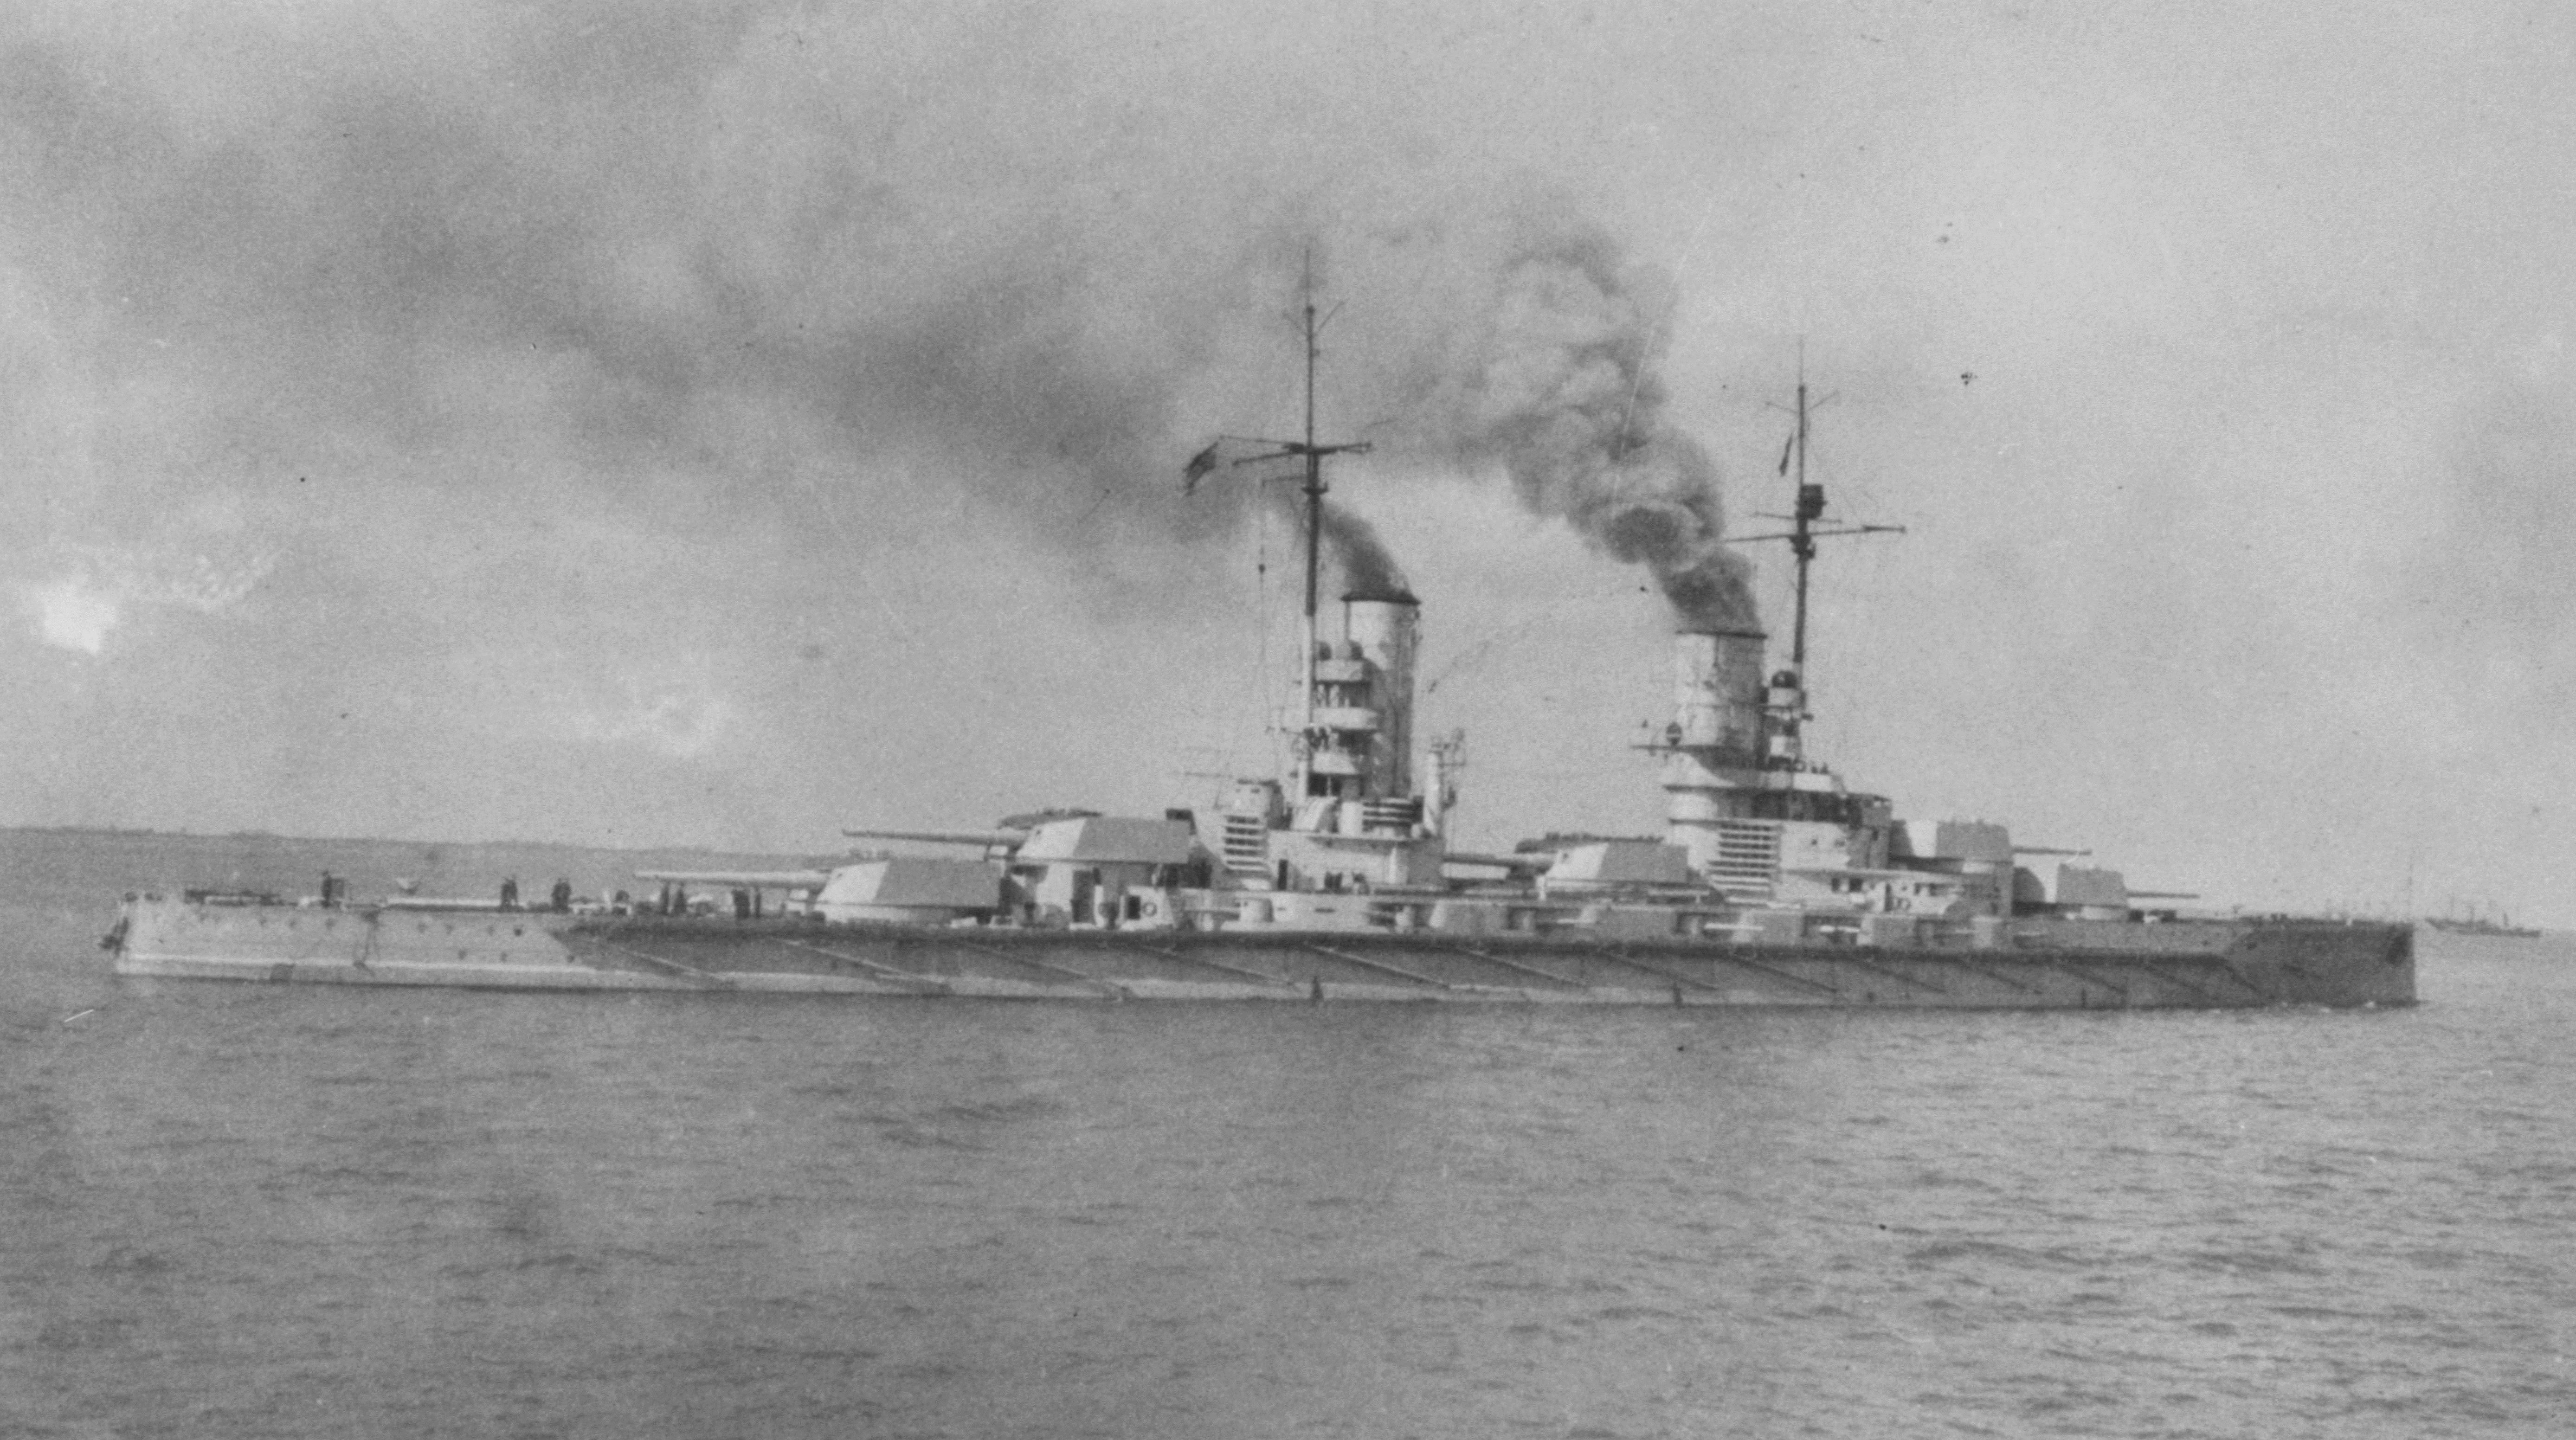 König class battleship